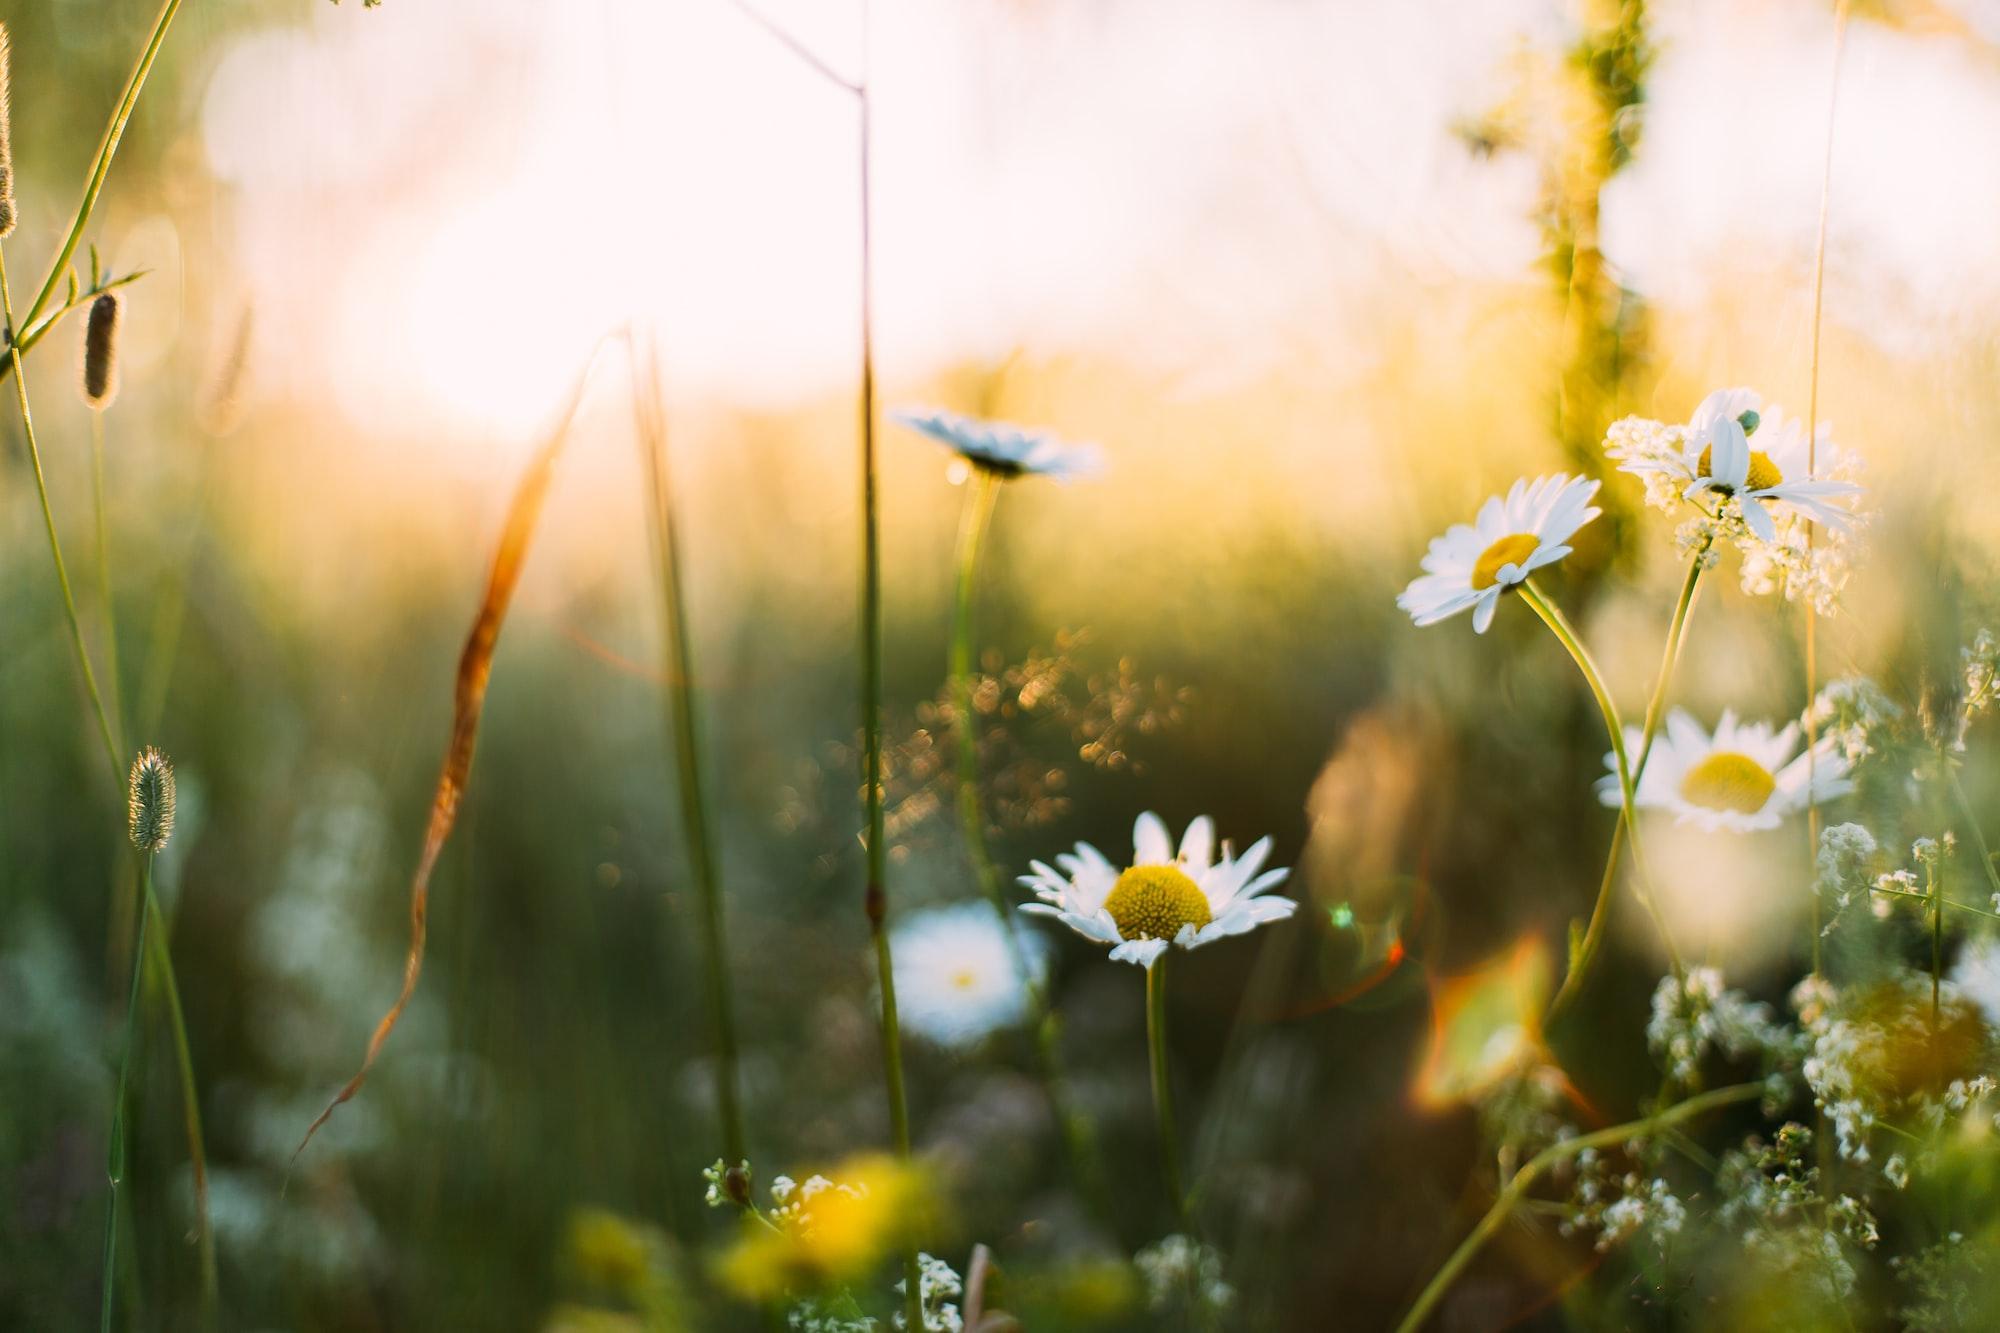 Yellow flowers white petals